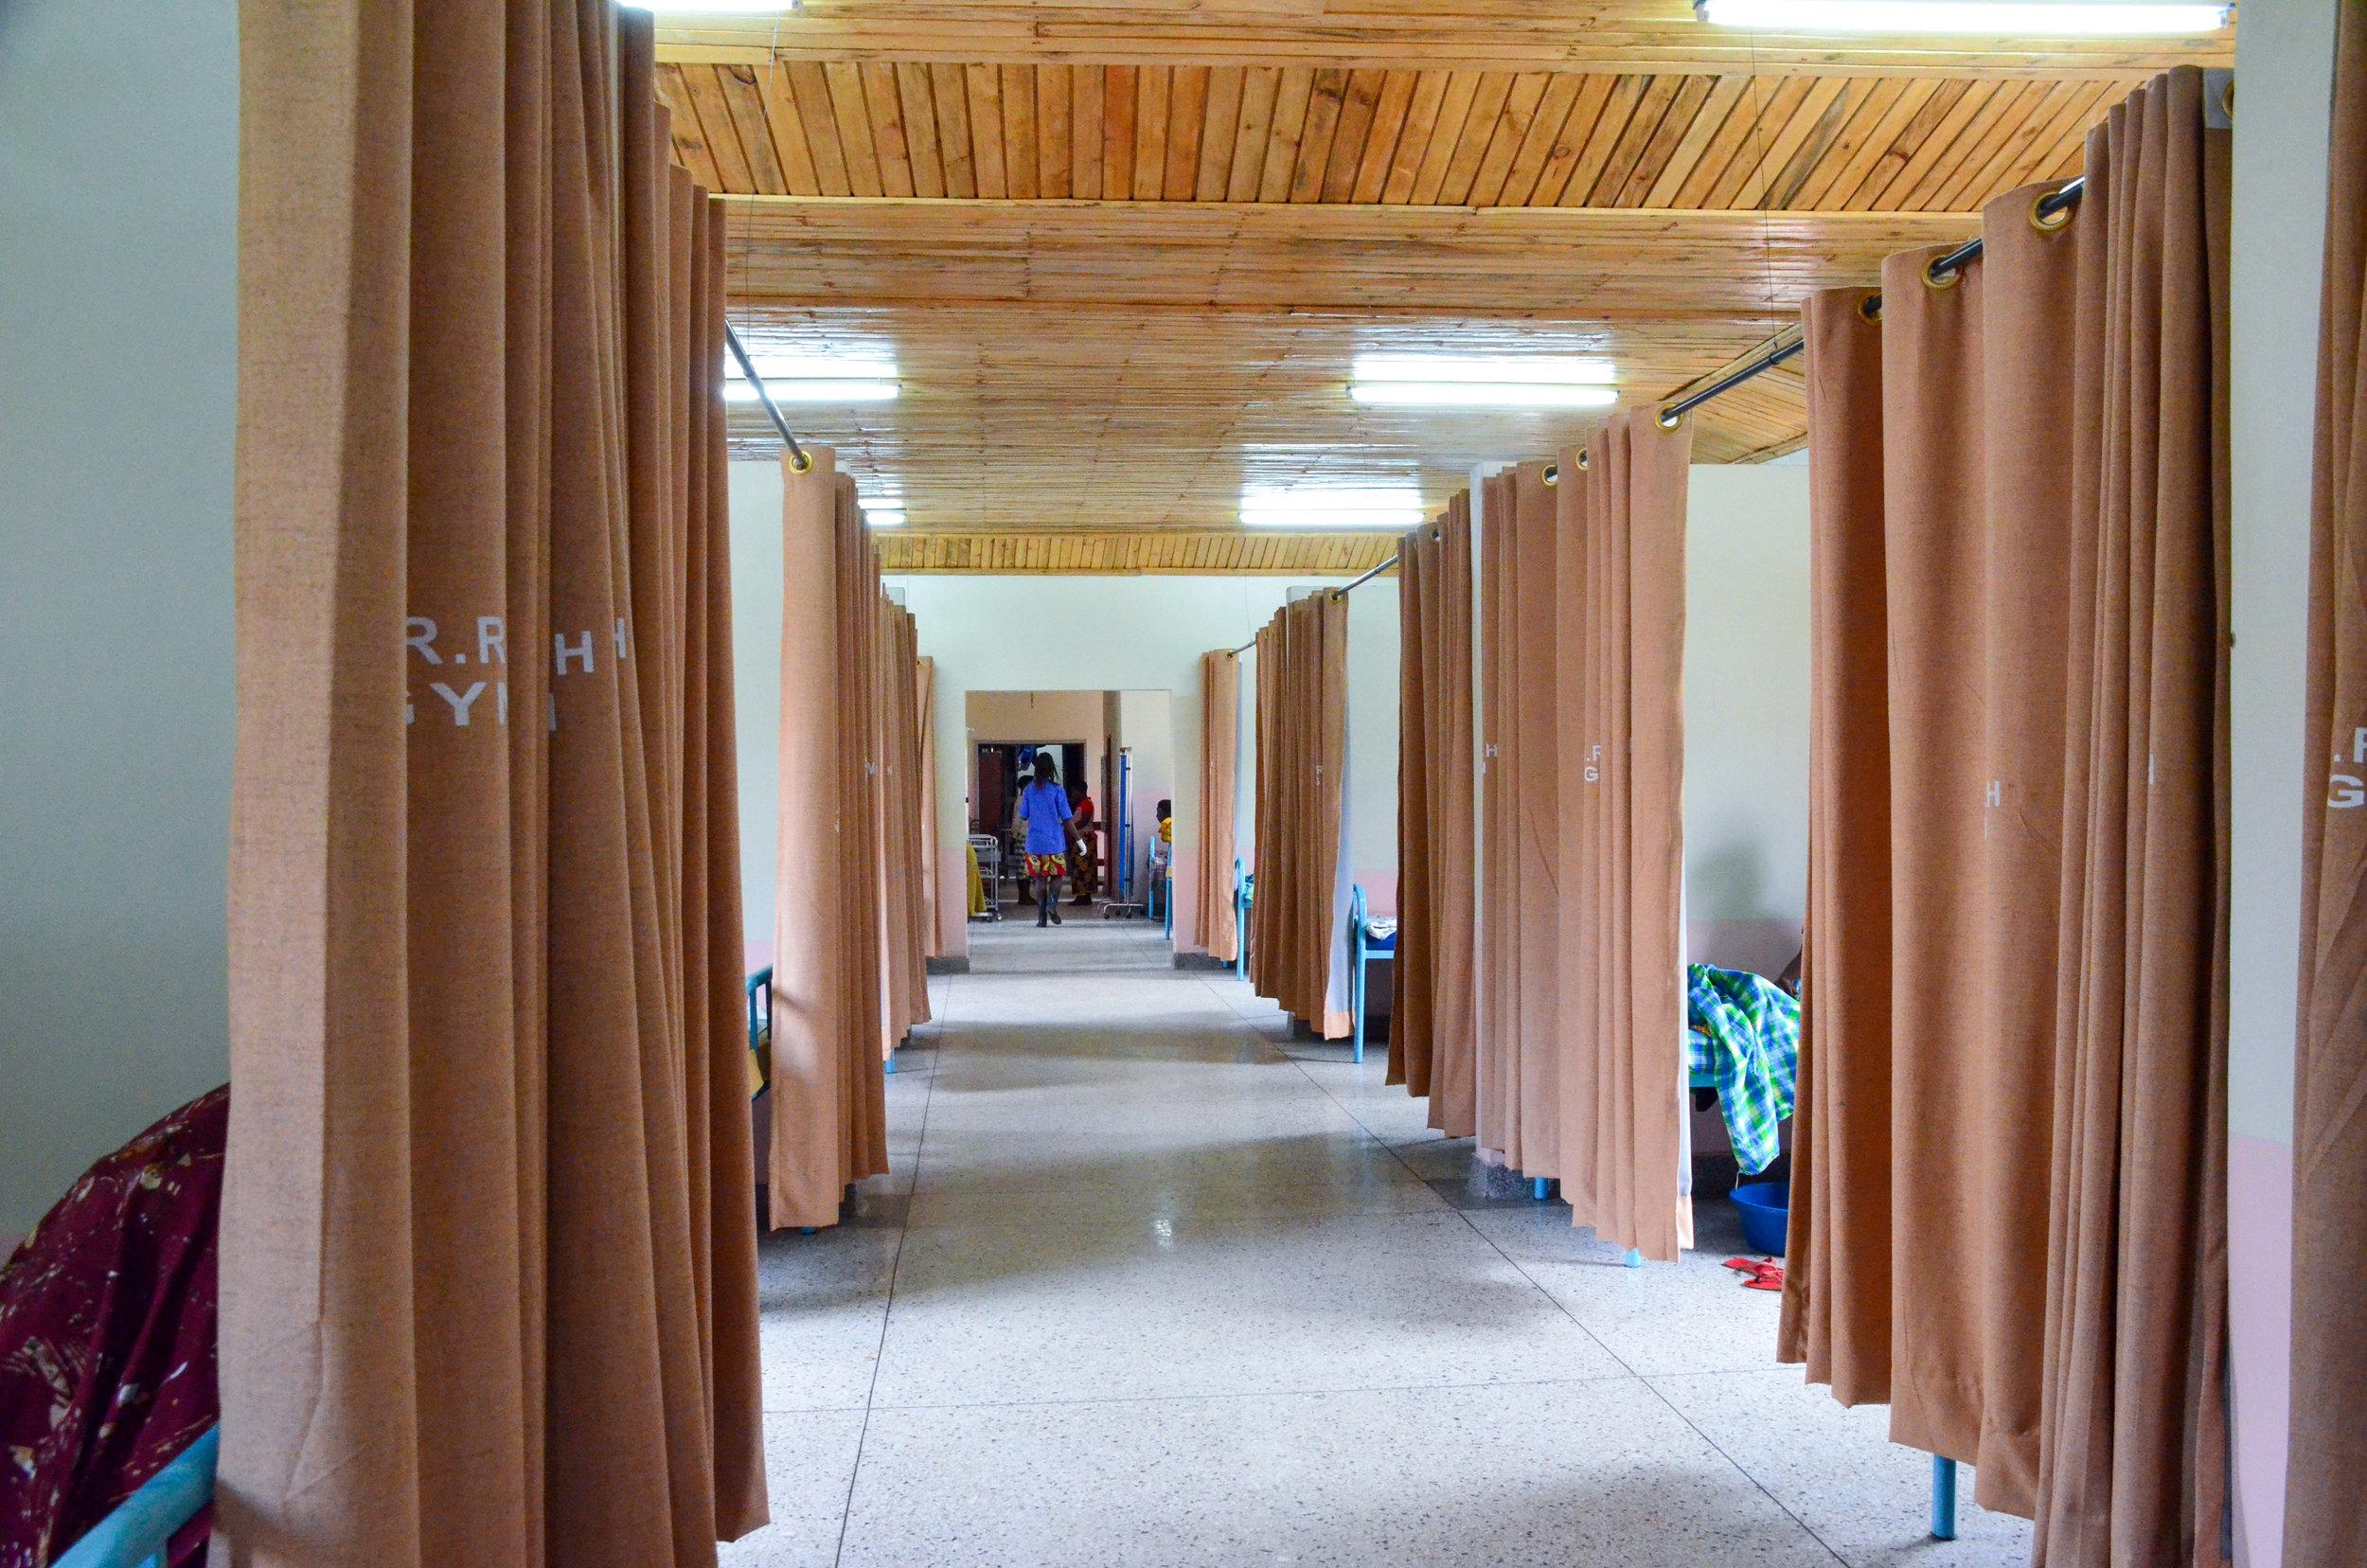 Uganda Mbarara Hospital 2018-51.jpg